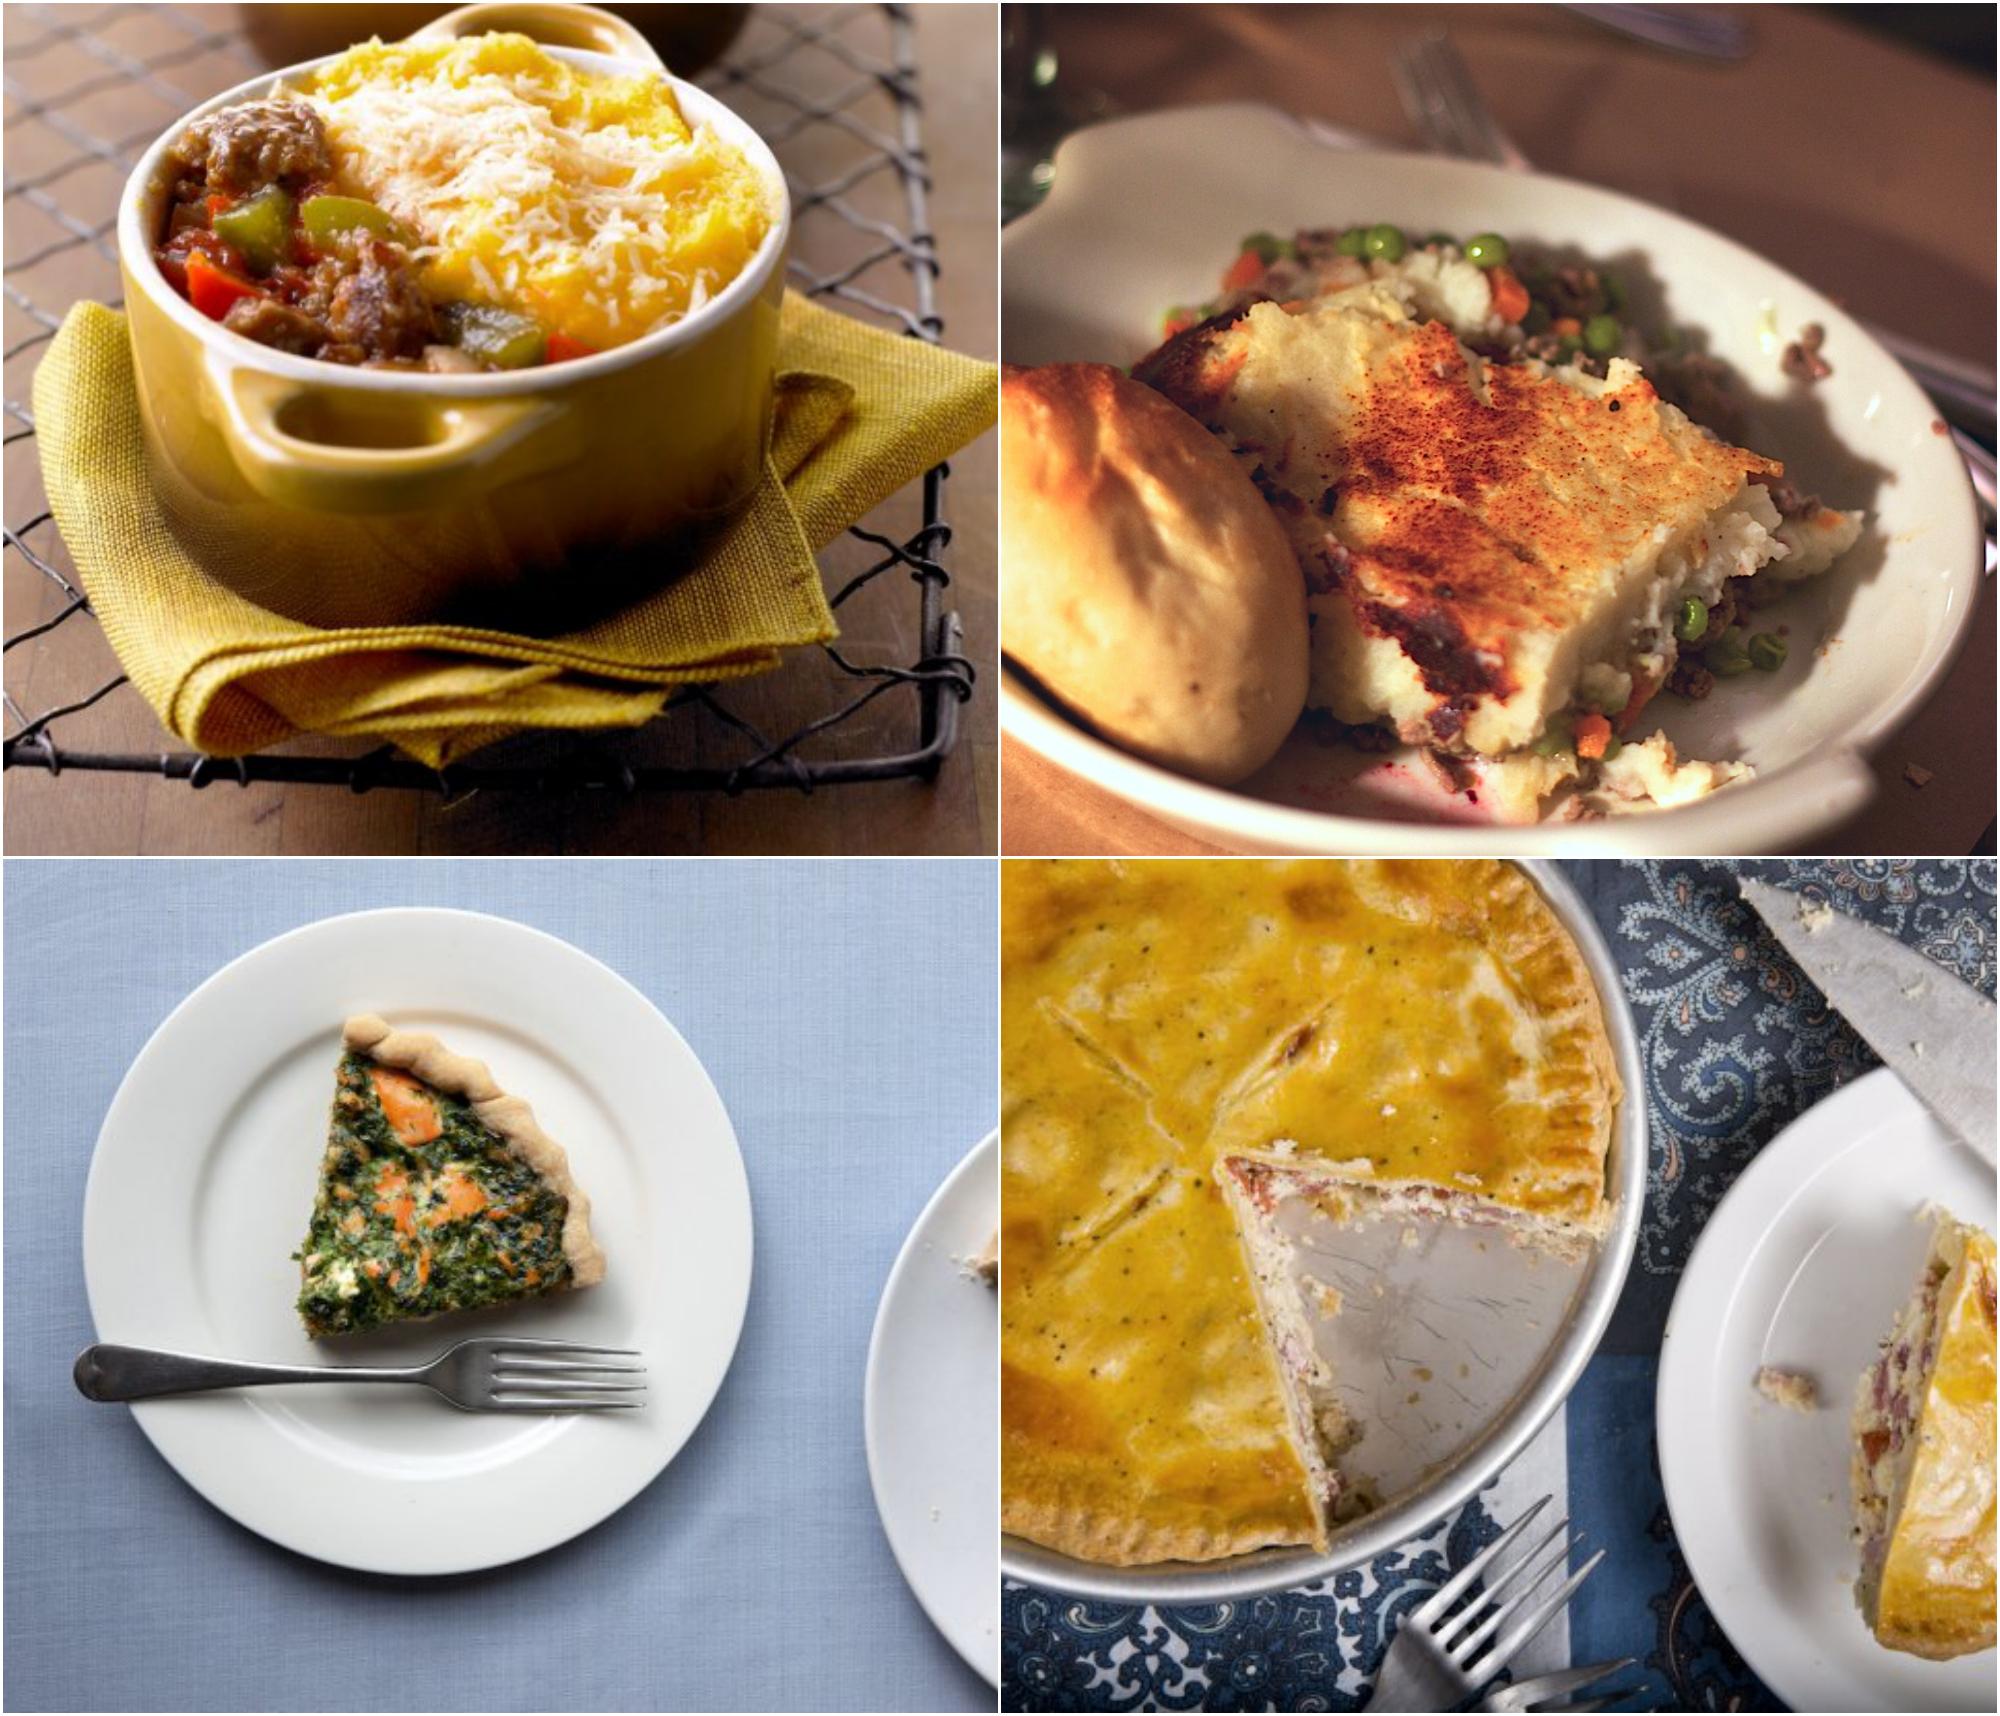 9 Ideas For Dinner Tonight: Savory Pies - Food Republic